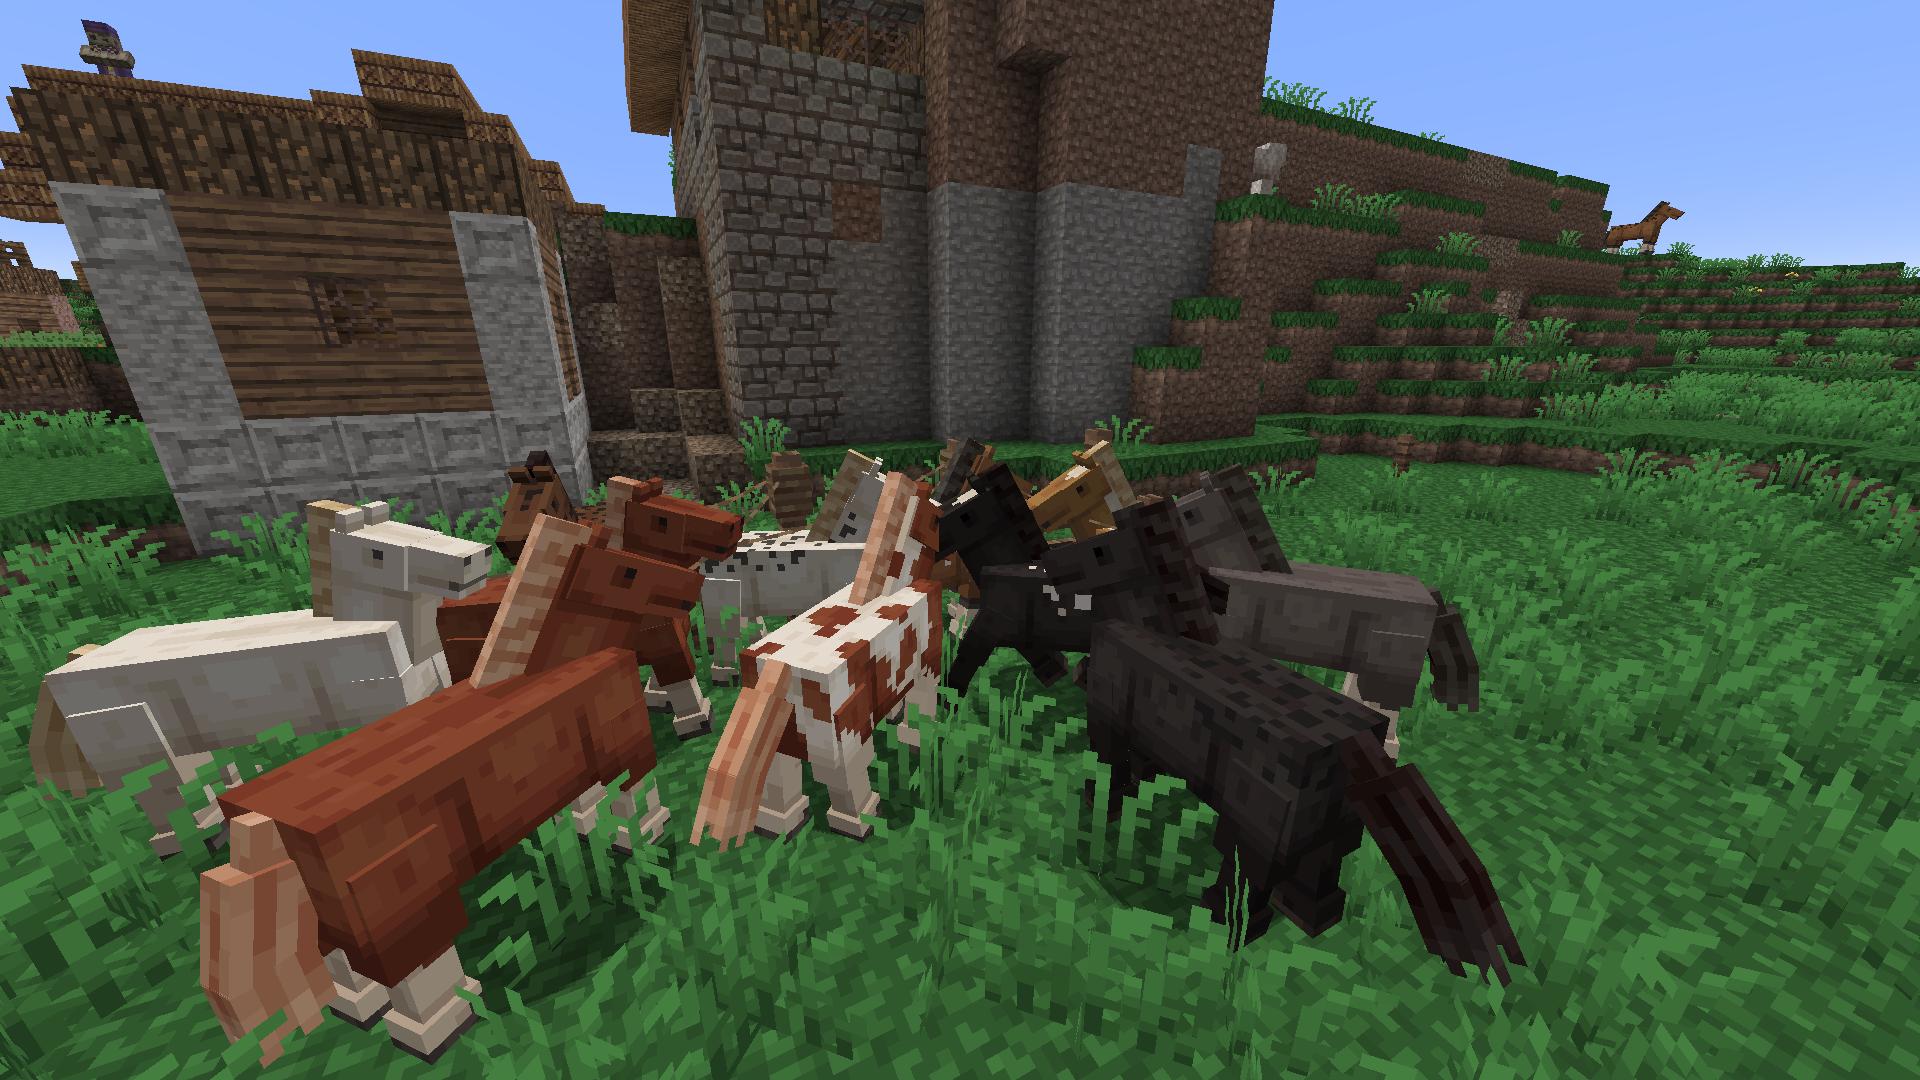 моды для майнкрафт с лошадьми 1.11.2 #1